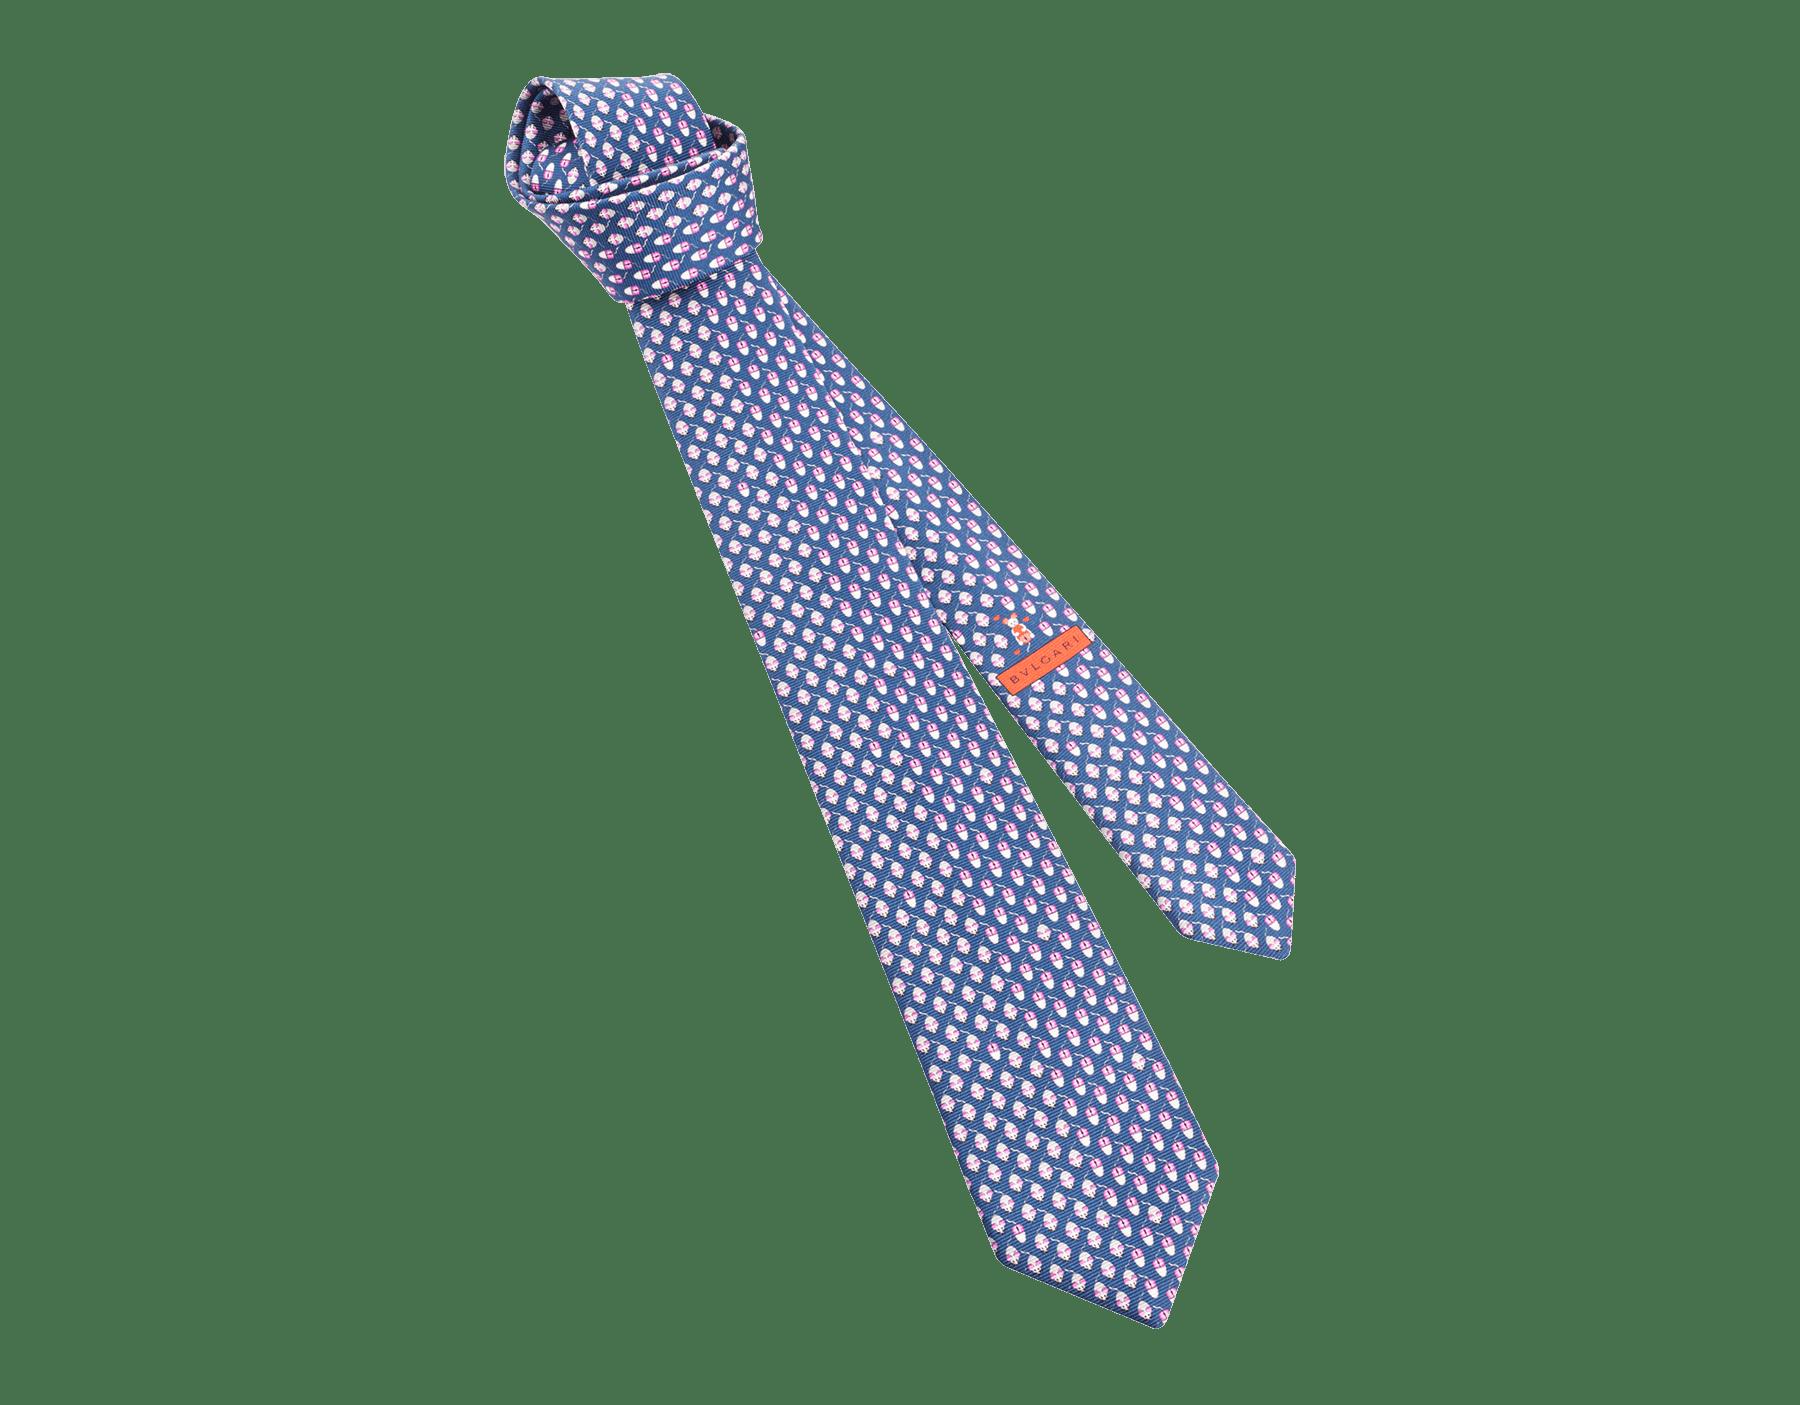 紫丁香色「Mouse Click」上等印花薩里昂絲七褶領帶。 MouseClick image 1